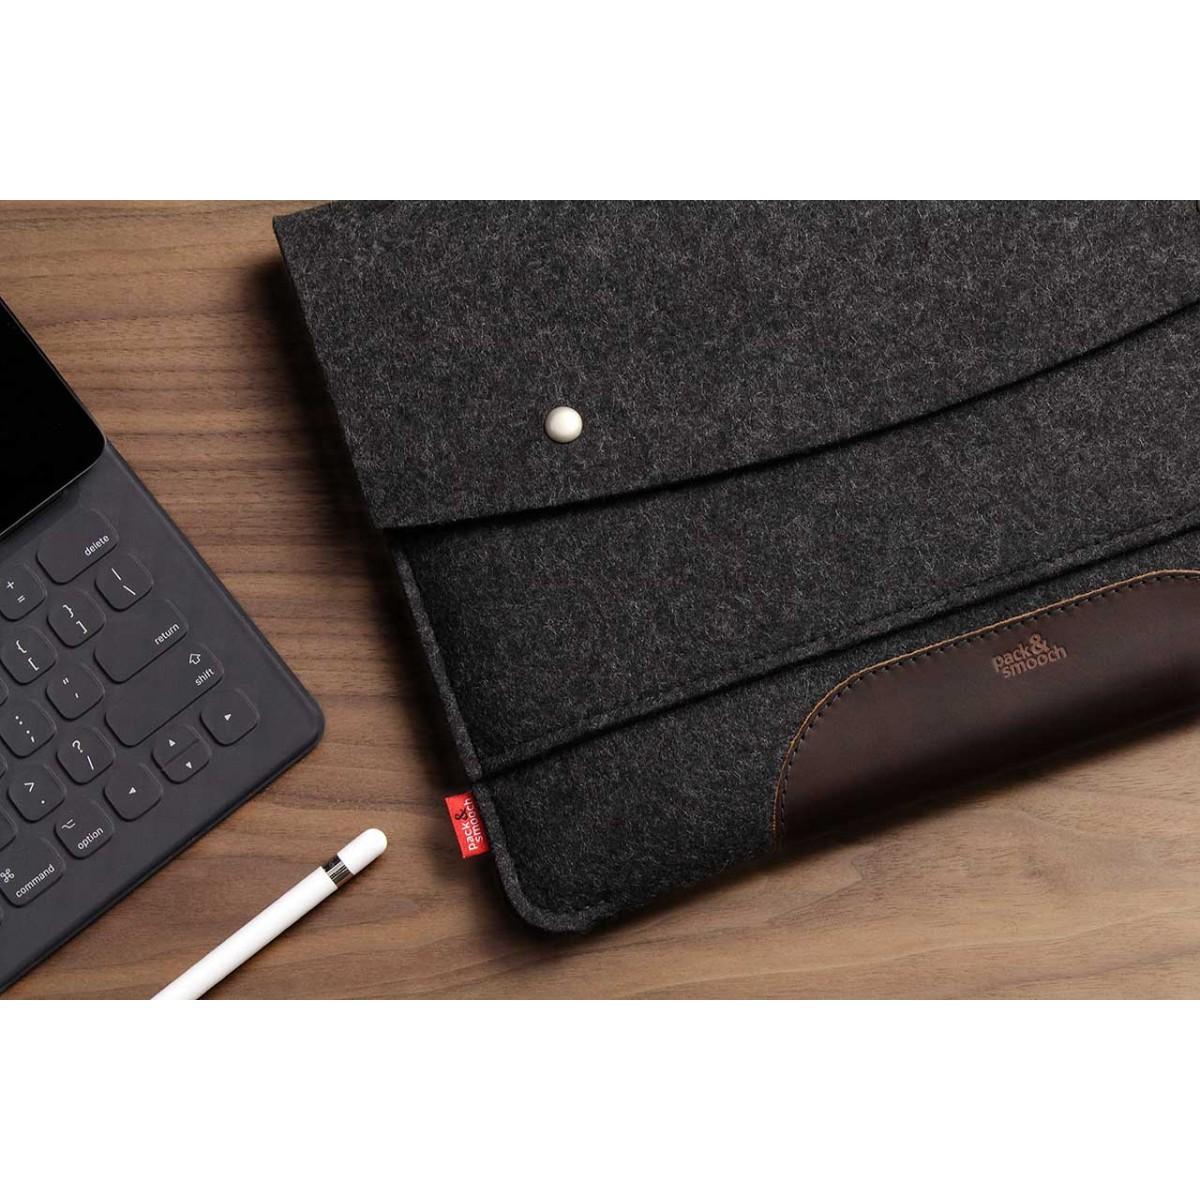 Pack & Smooch iPad Pro 12.9 Hülle, Sleeve HAMPSHIRE